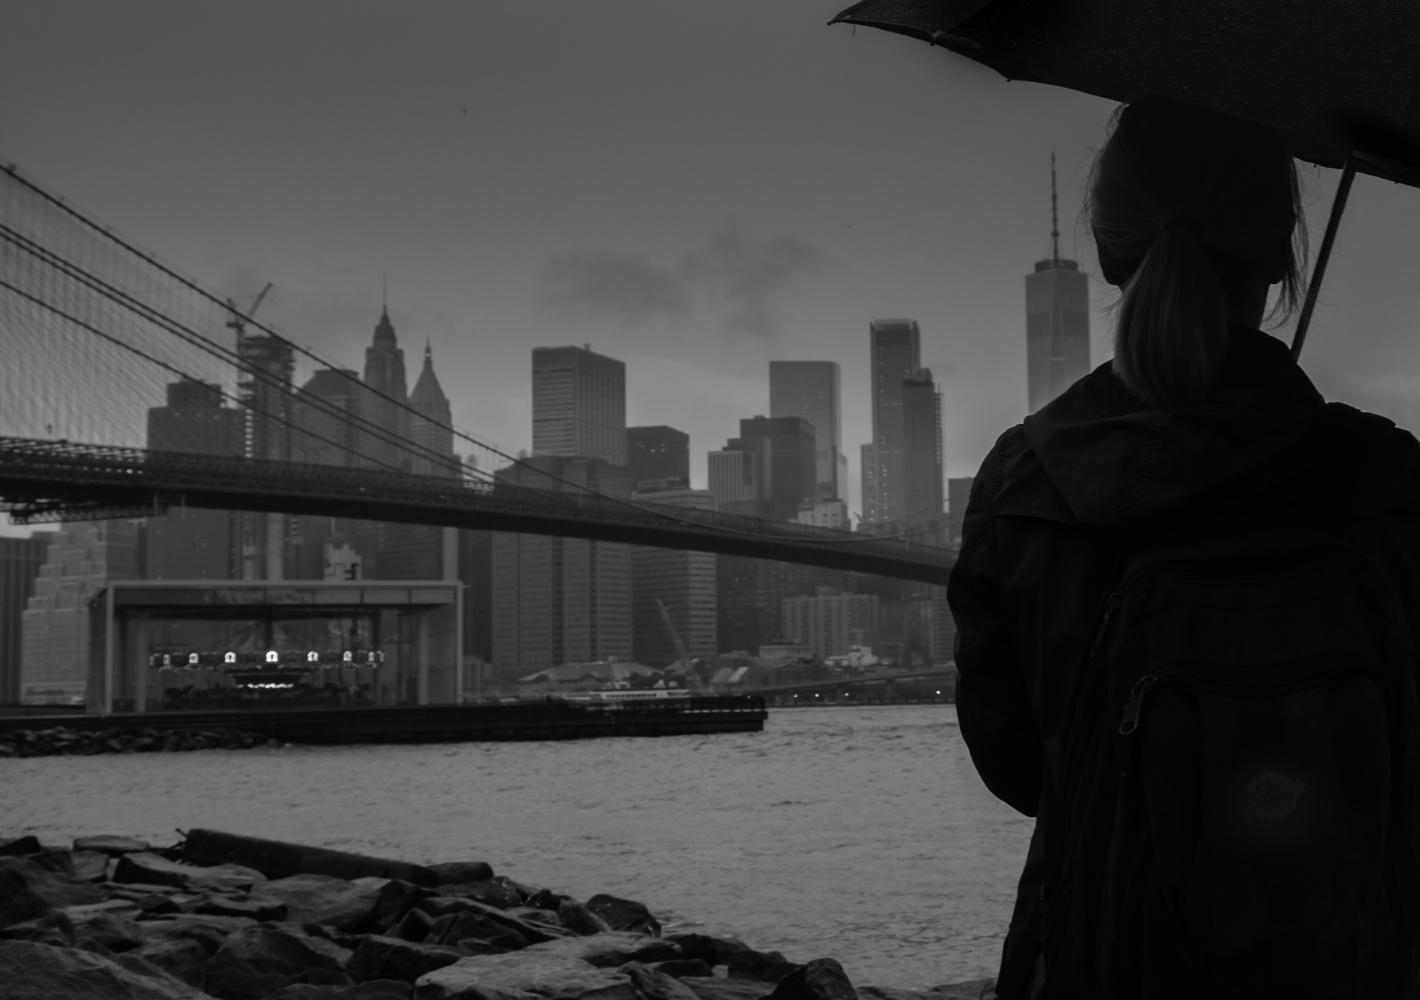 Rainy Solitude by Phil Blair